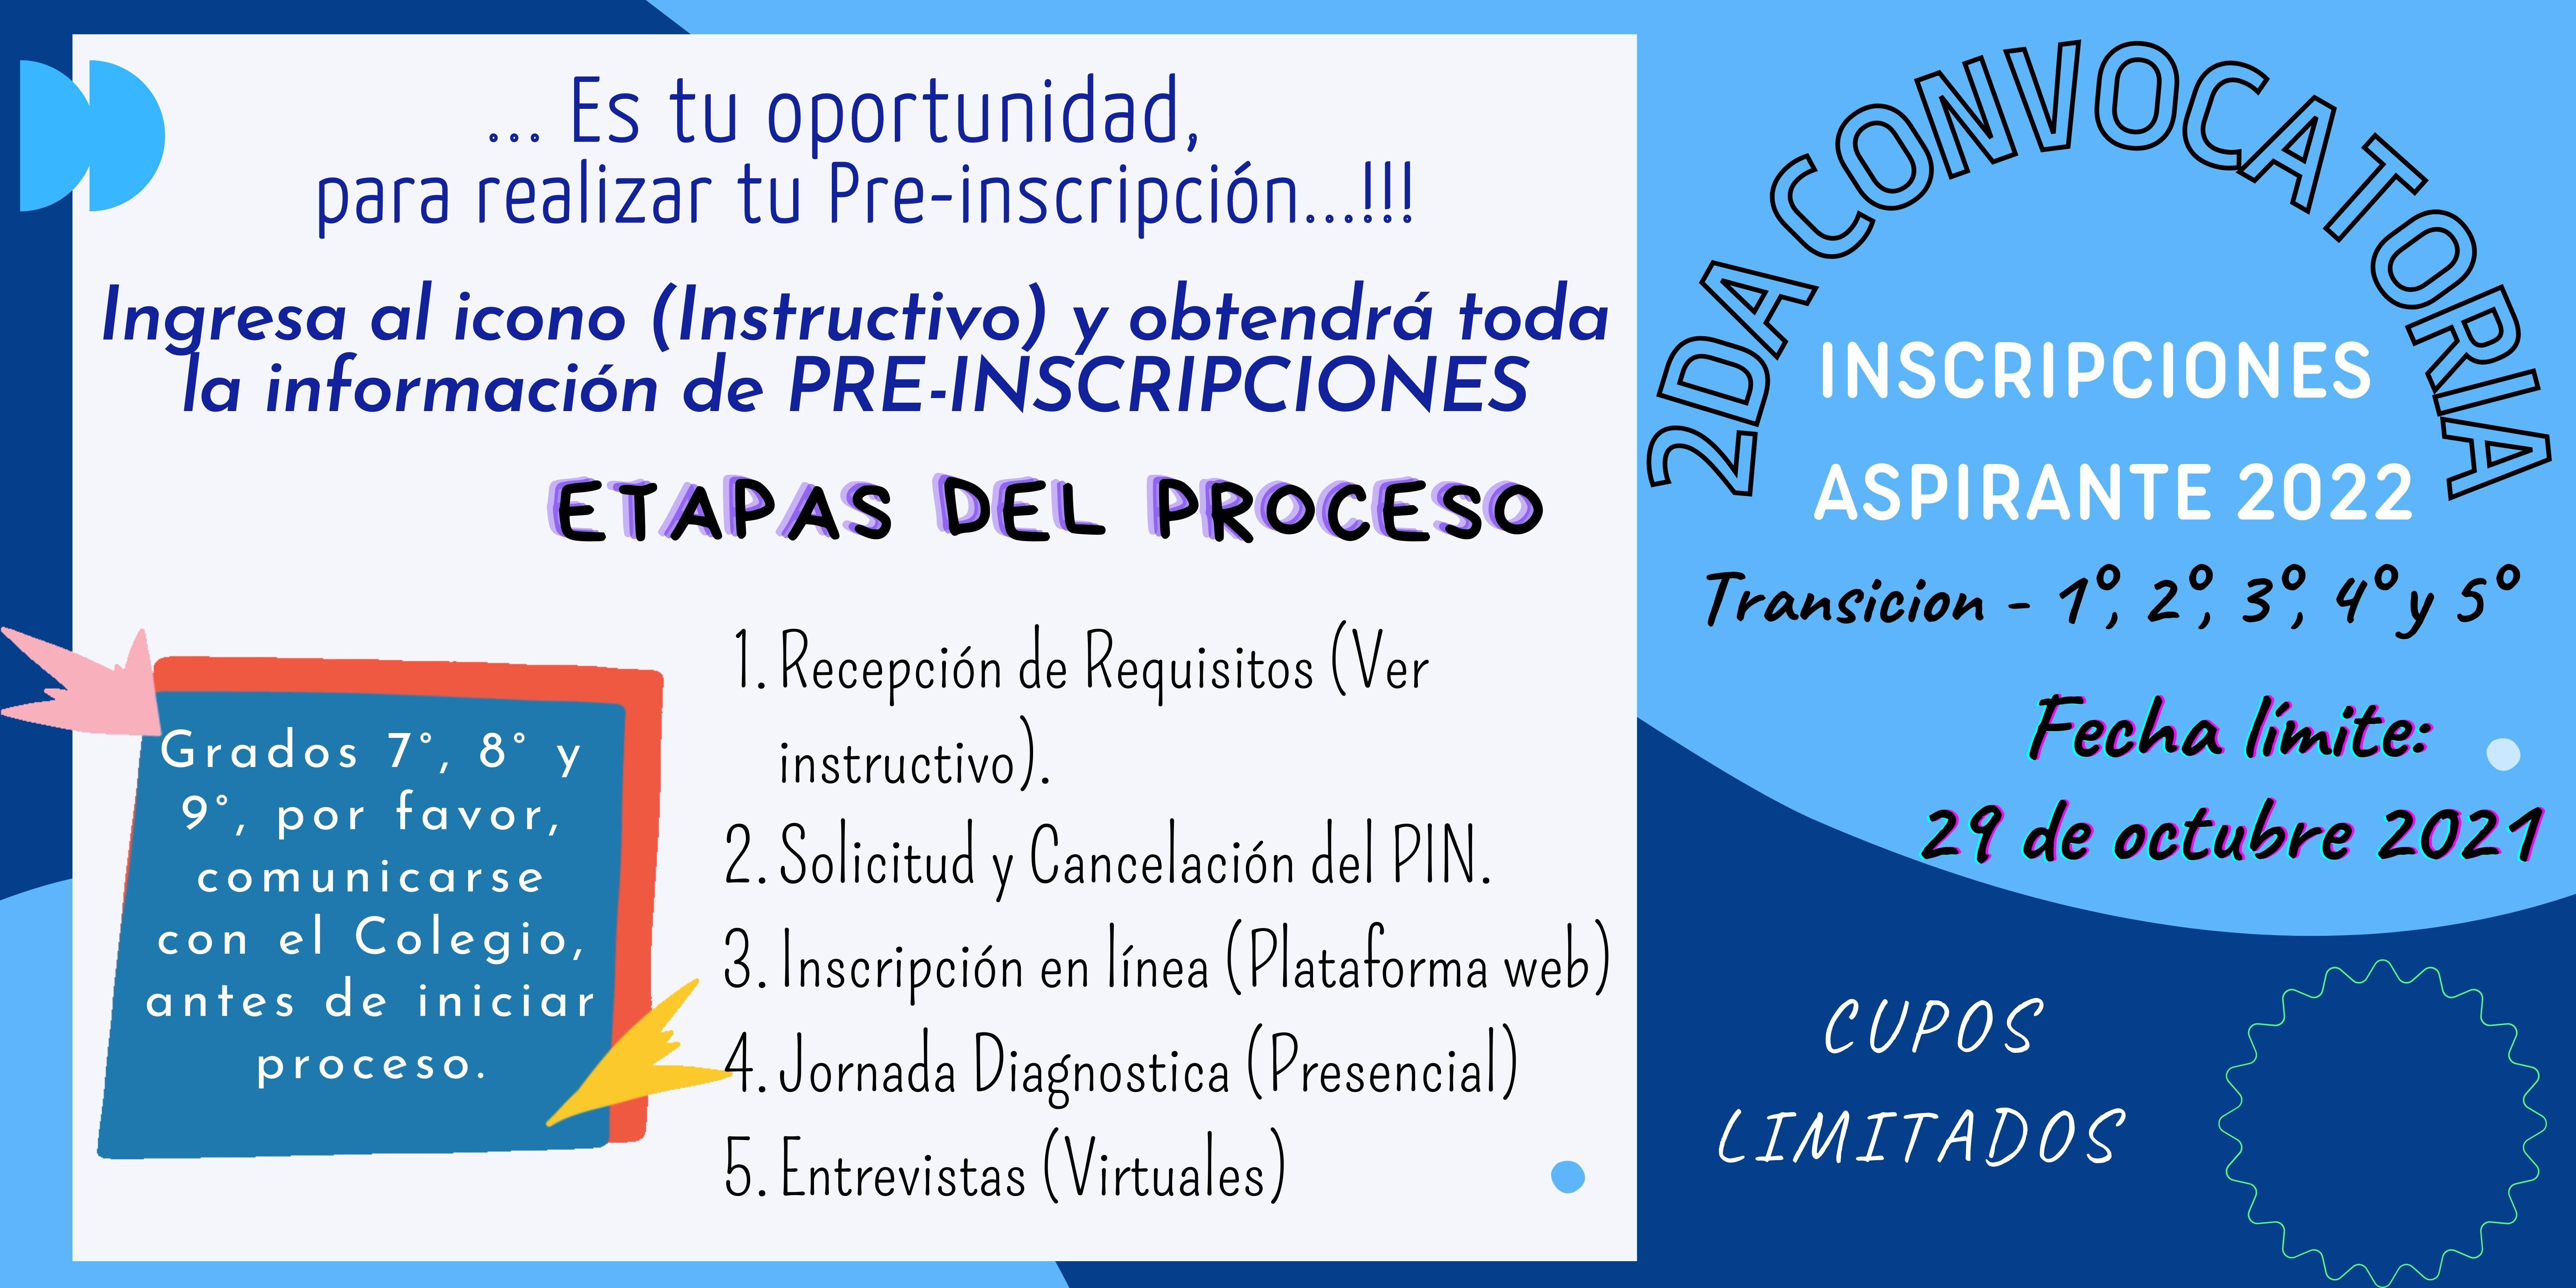 2DA_CONVOCATORIA_INSCRIPCIONES